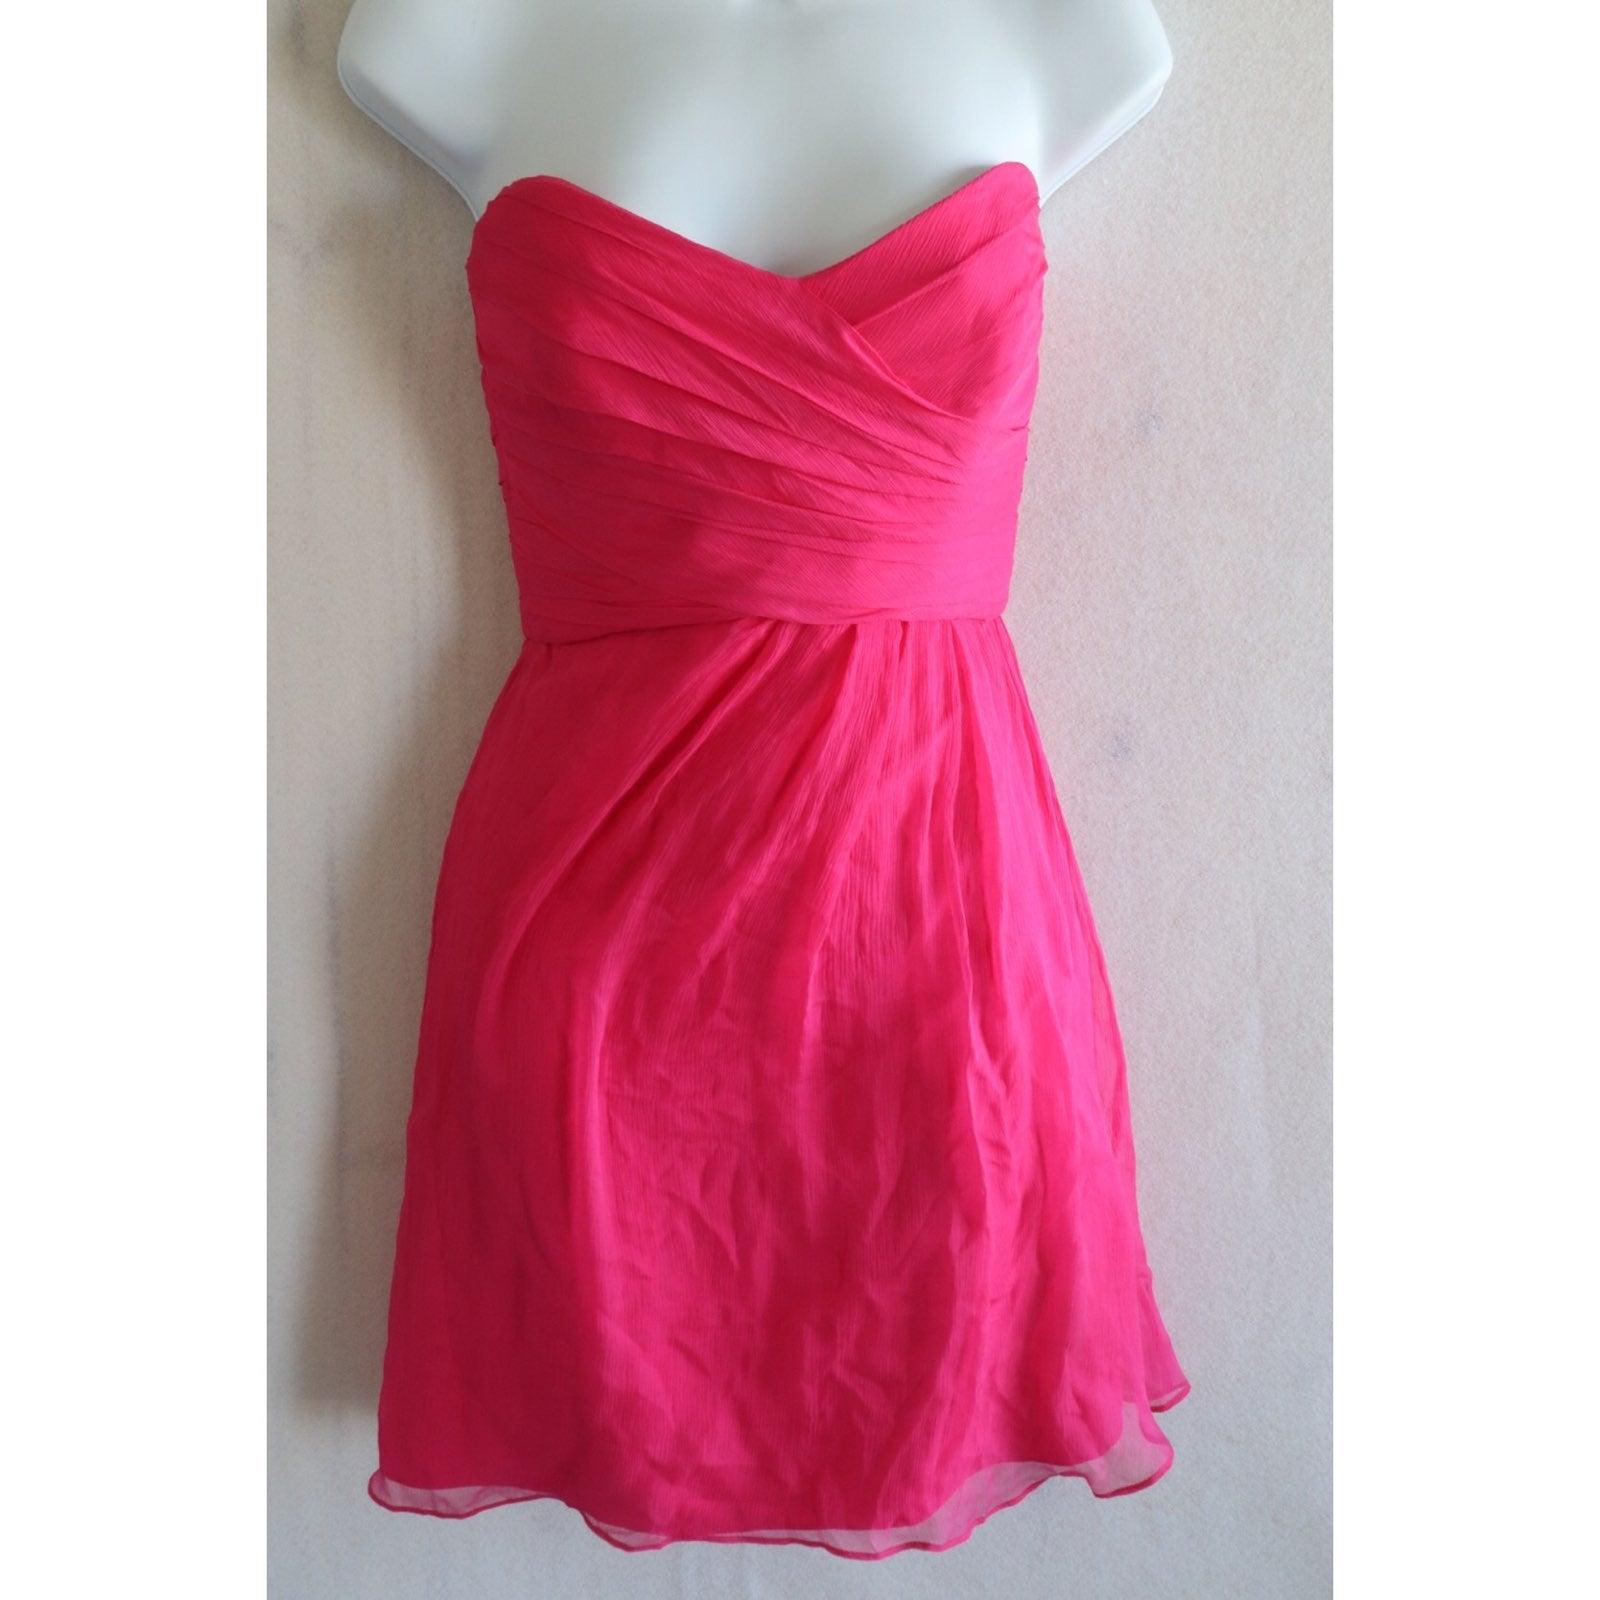 Amsale 100% Silk Strapless Dress Sz 6